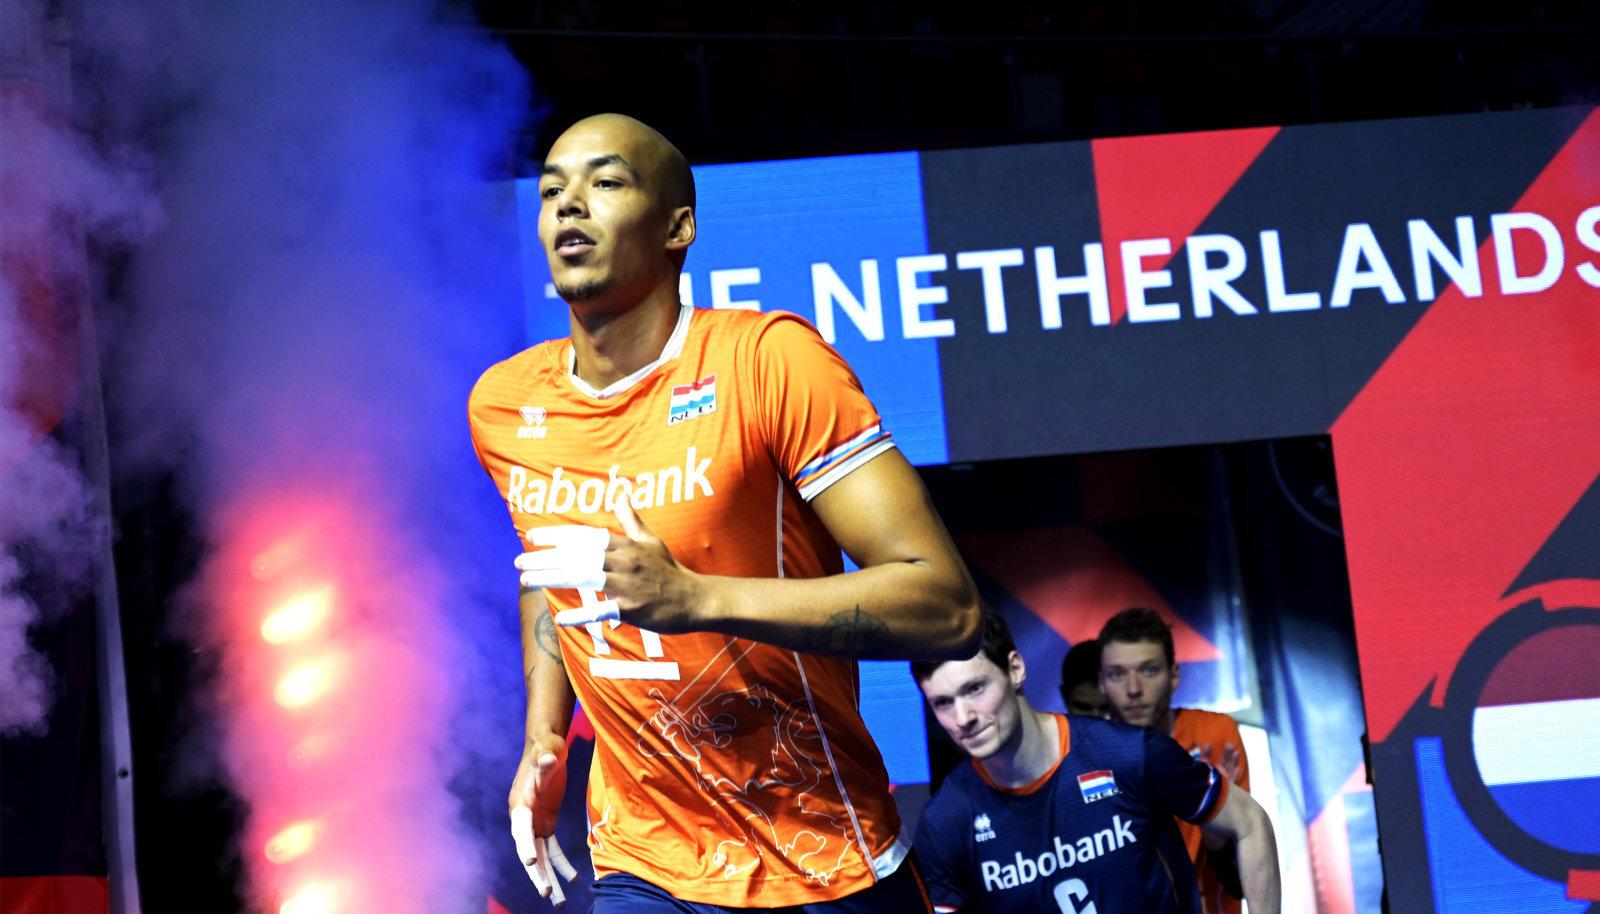 Hollandi liider Nimir Abdel-Aziz tõi täna koguni 37 punkti.